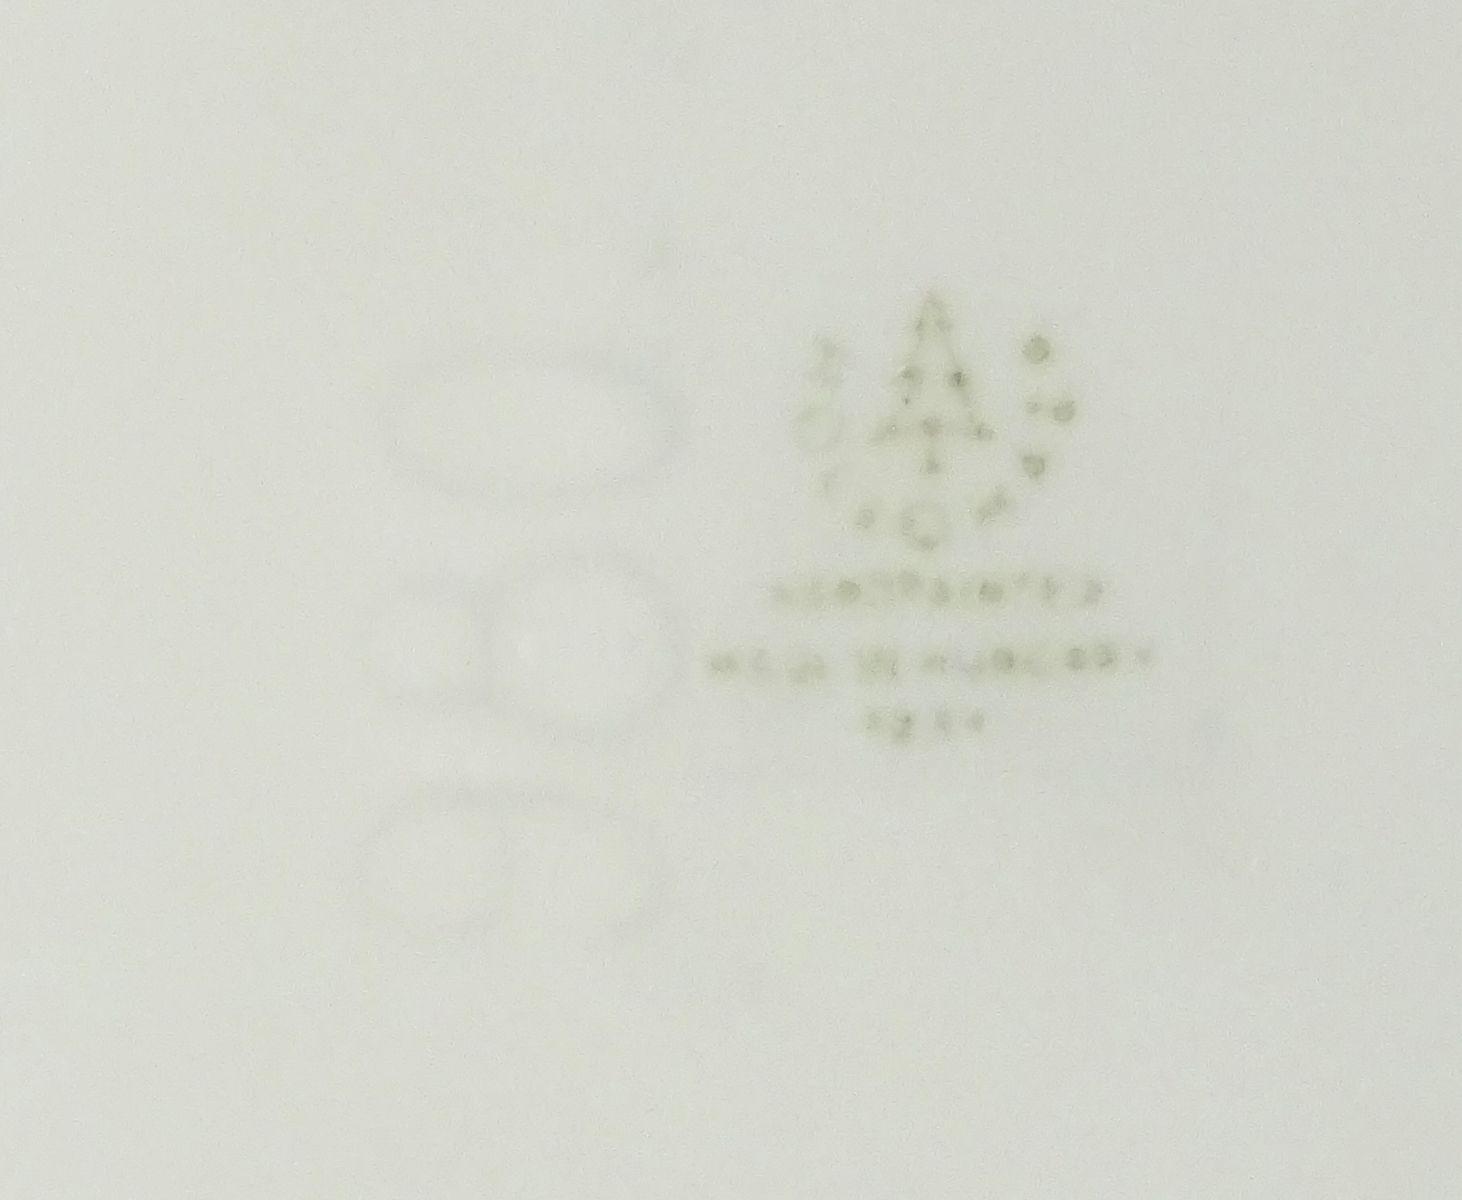 DSC05811.JPG (1462×1200)